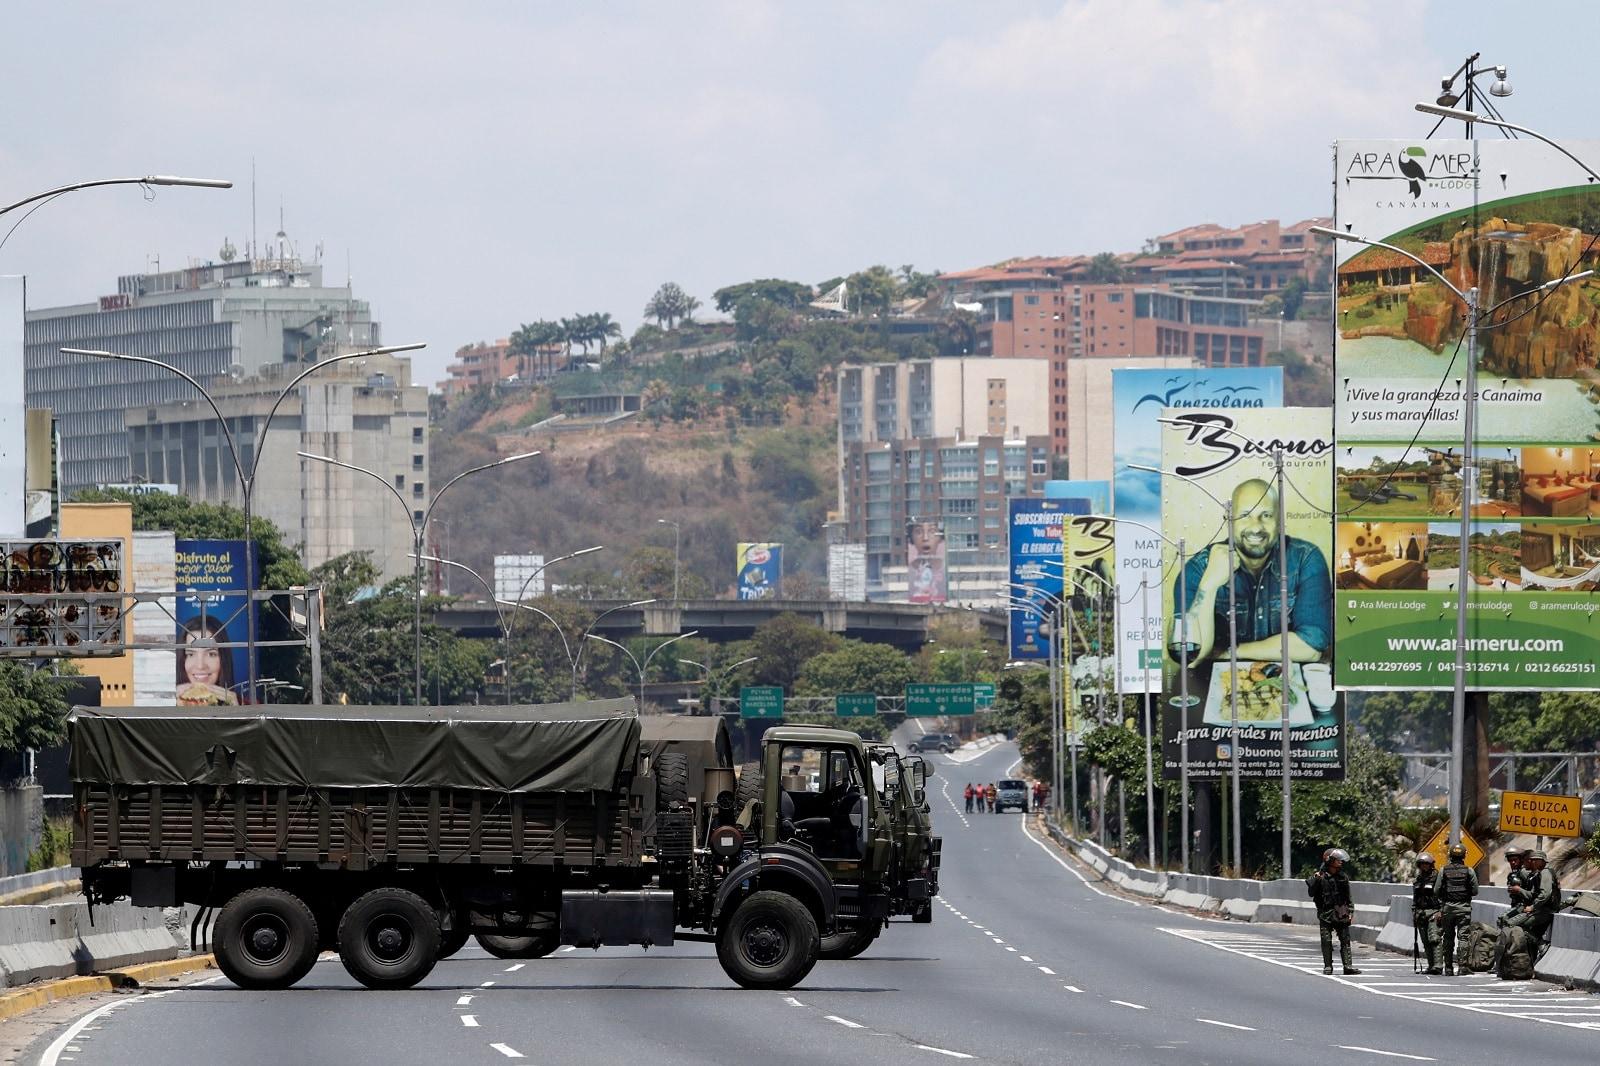 Military trucks partially block a highway in Caracas, Venezuela April 30, 2019. REUTERS/Carlos Garcia Rawlins